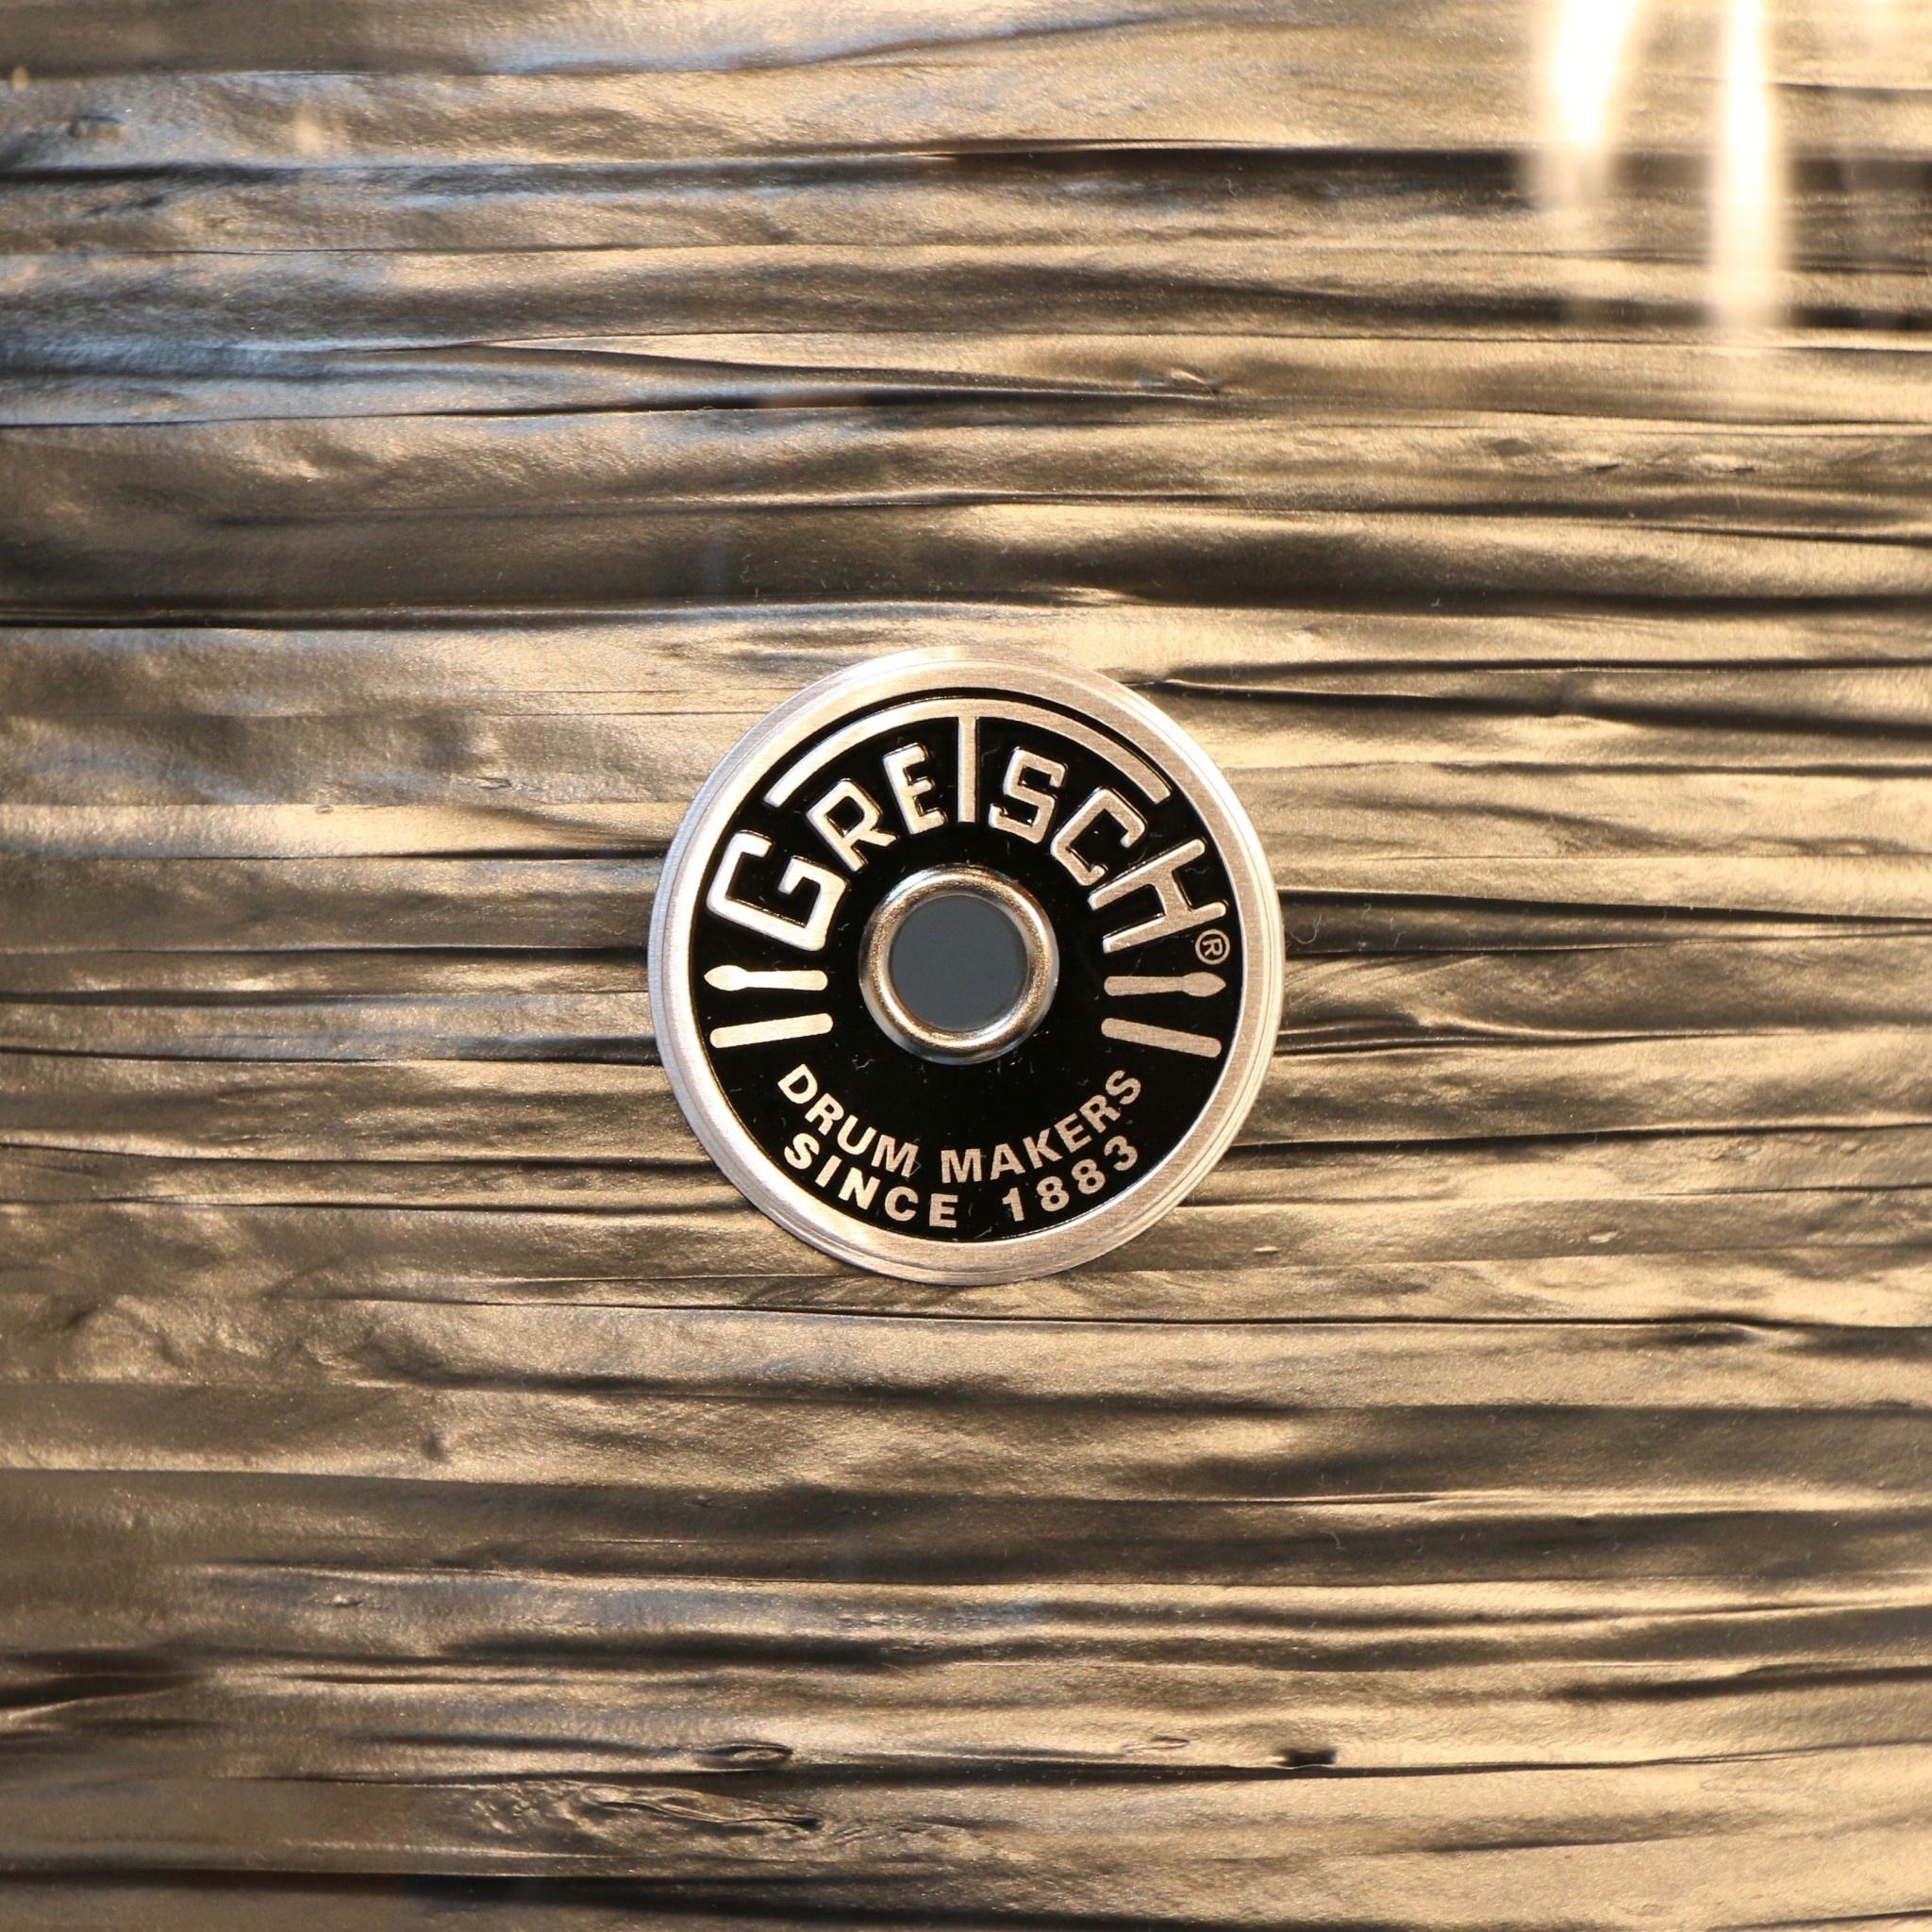 Gretsch Batterie Gretsch Brooklyn 22-13-16po - Grey Oyster